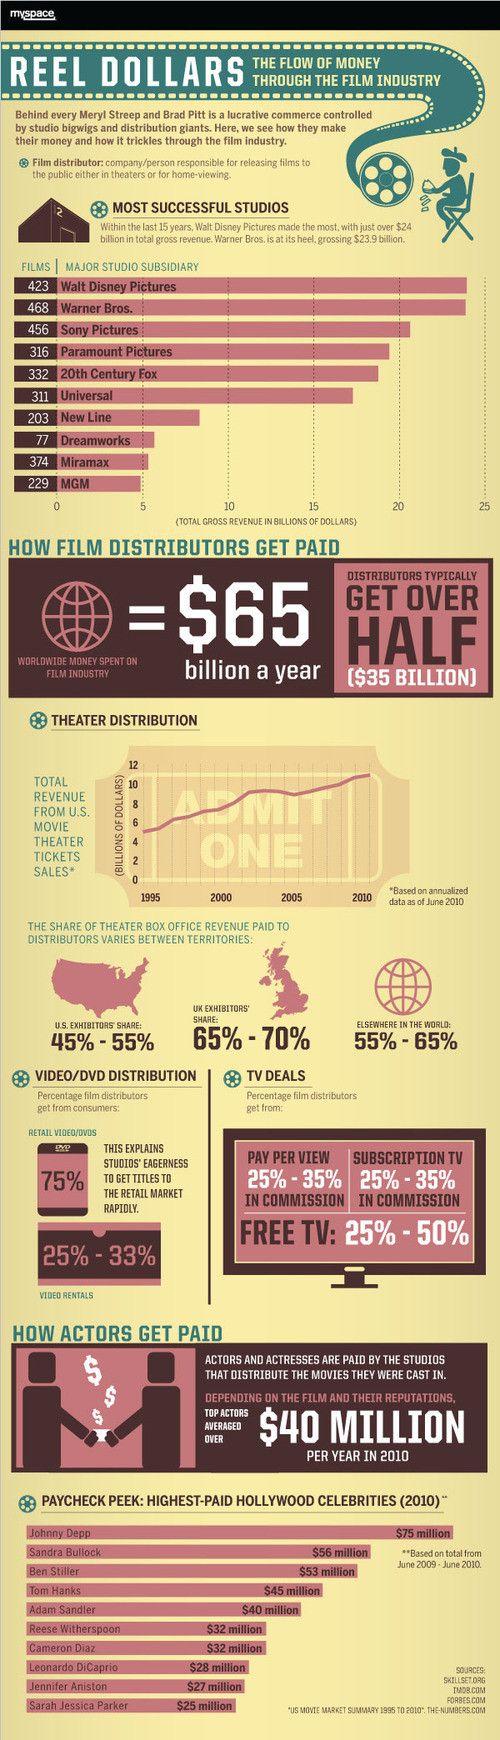 Filmmaking Infographics - Album on Imgur http://imgur.com/a/q1ej8#14